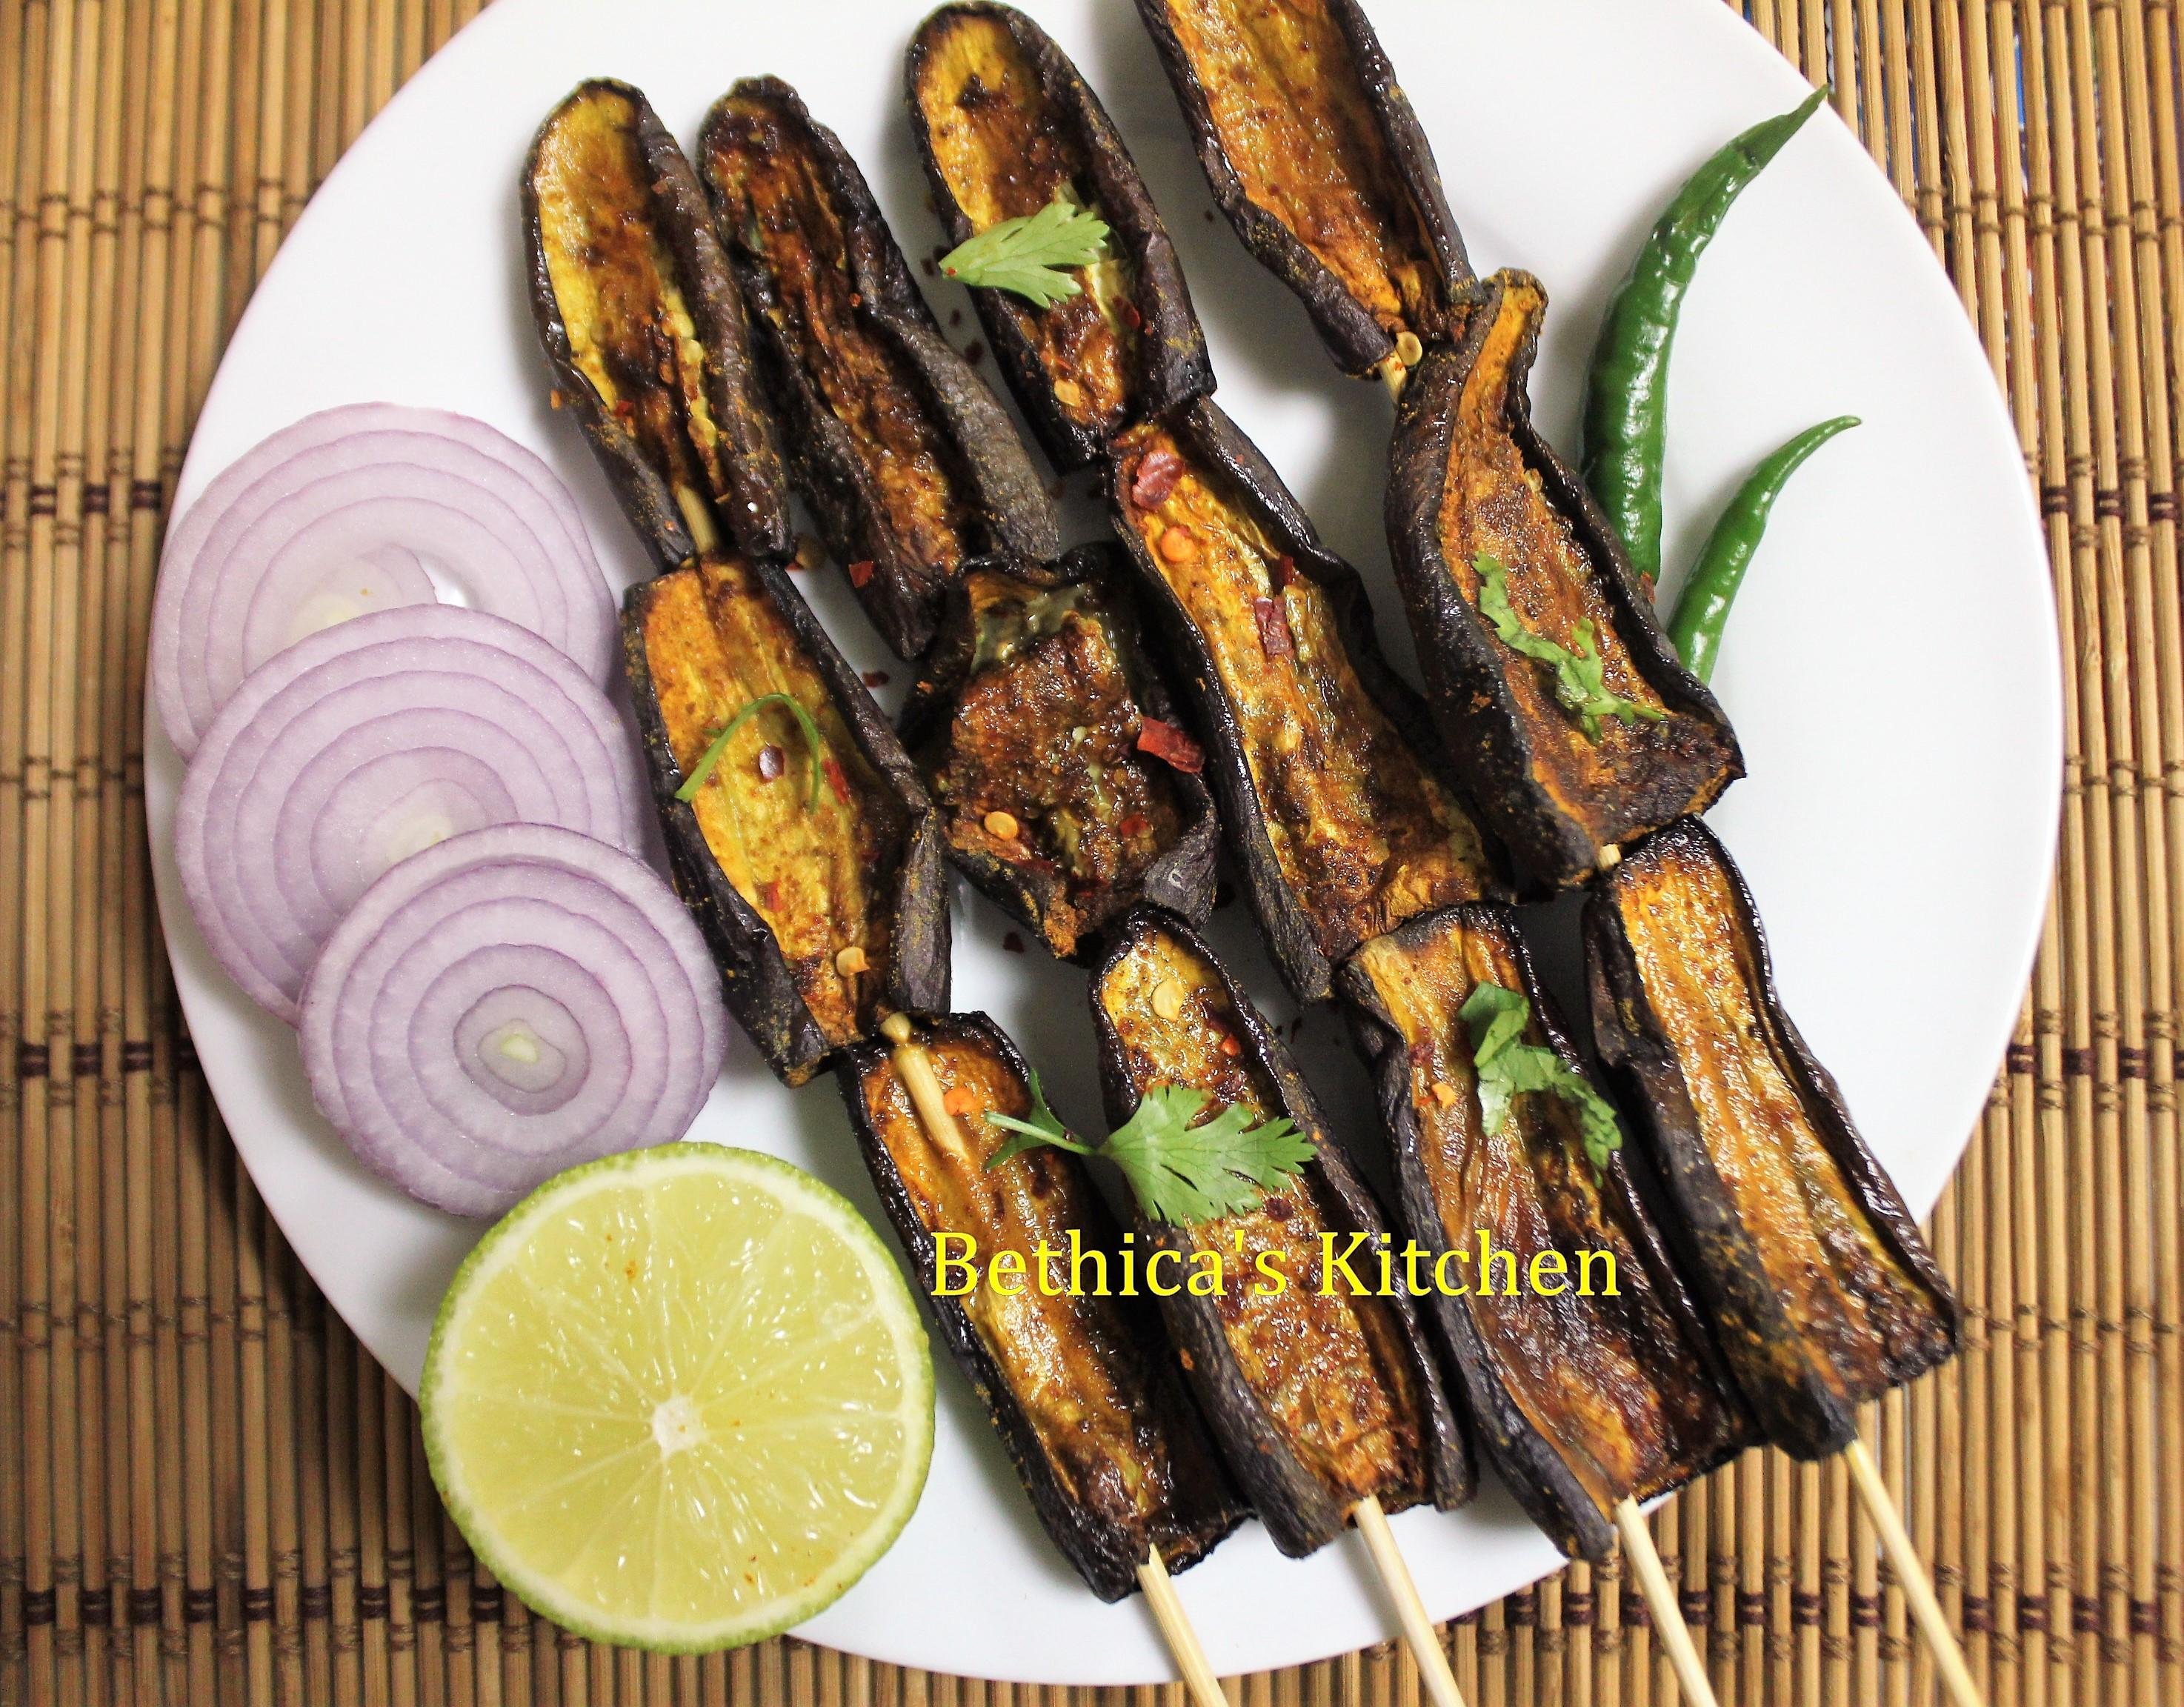 Grilled Chili Garlic Eggplants